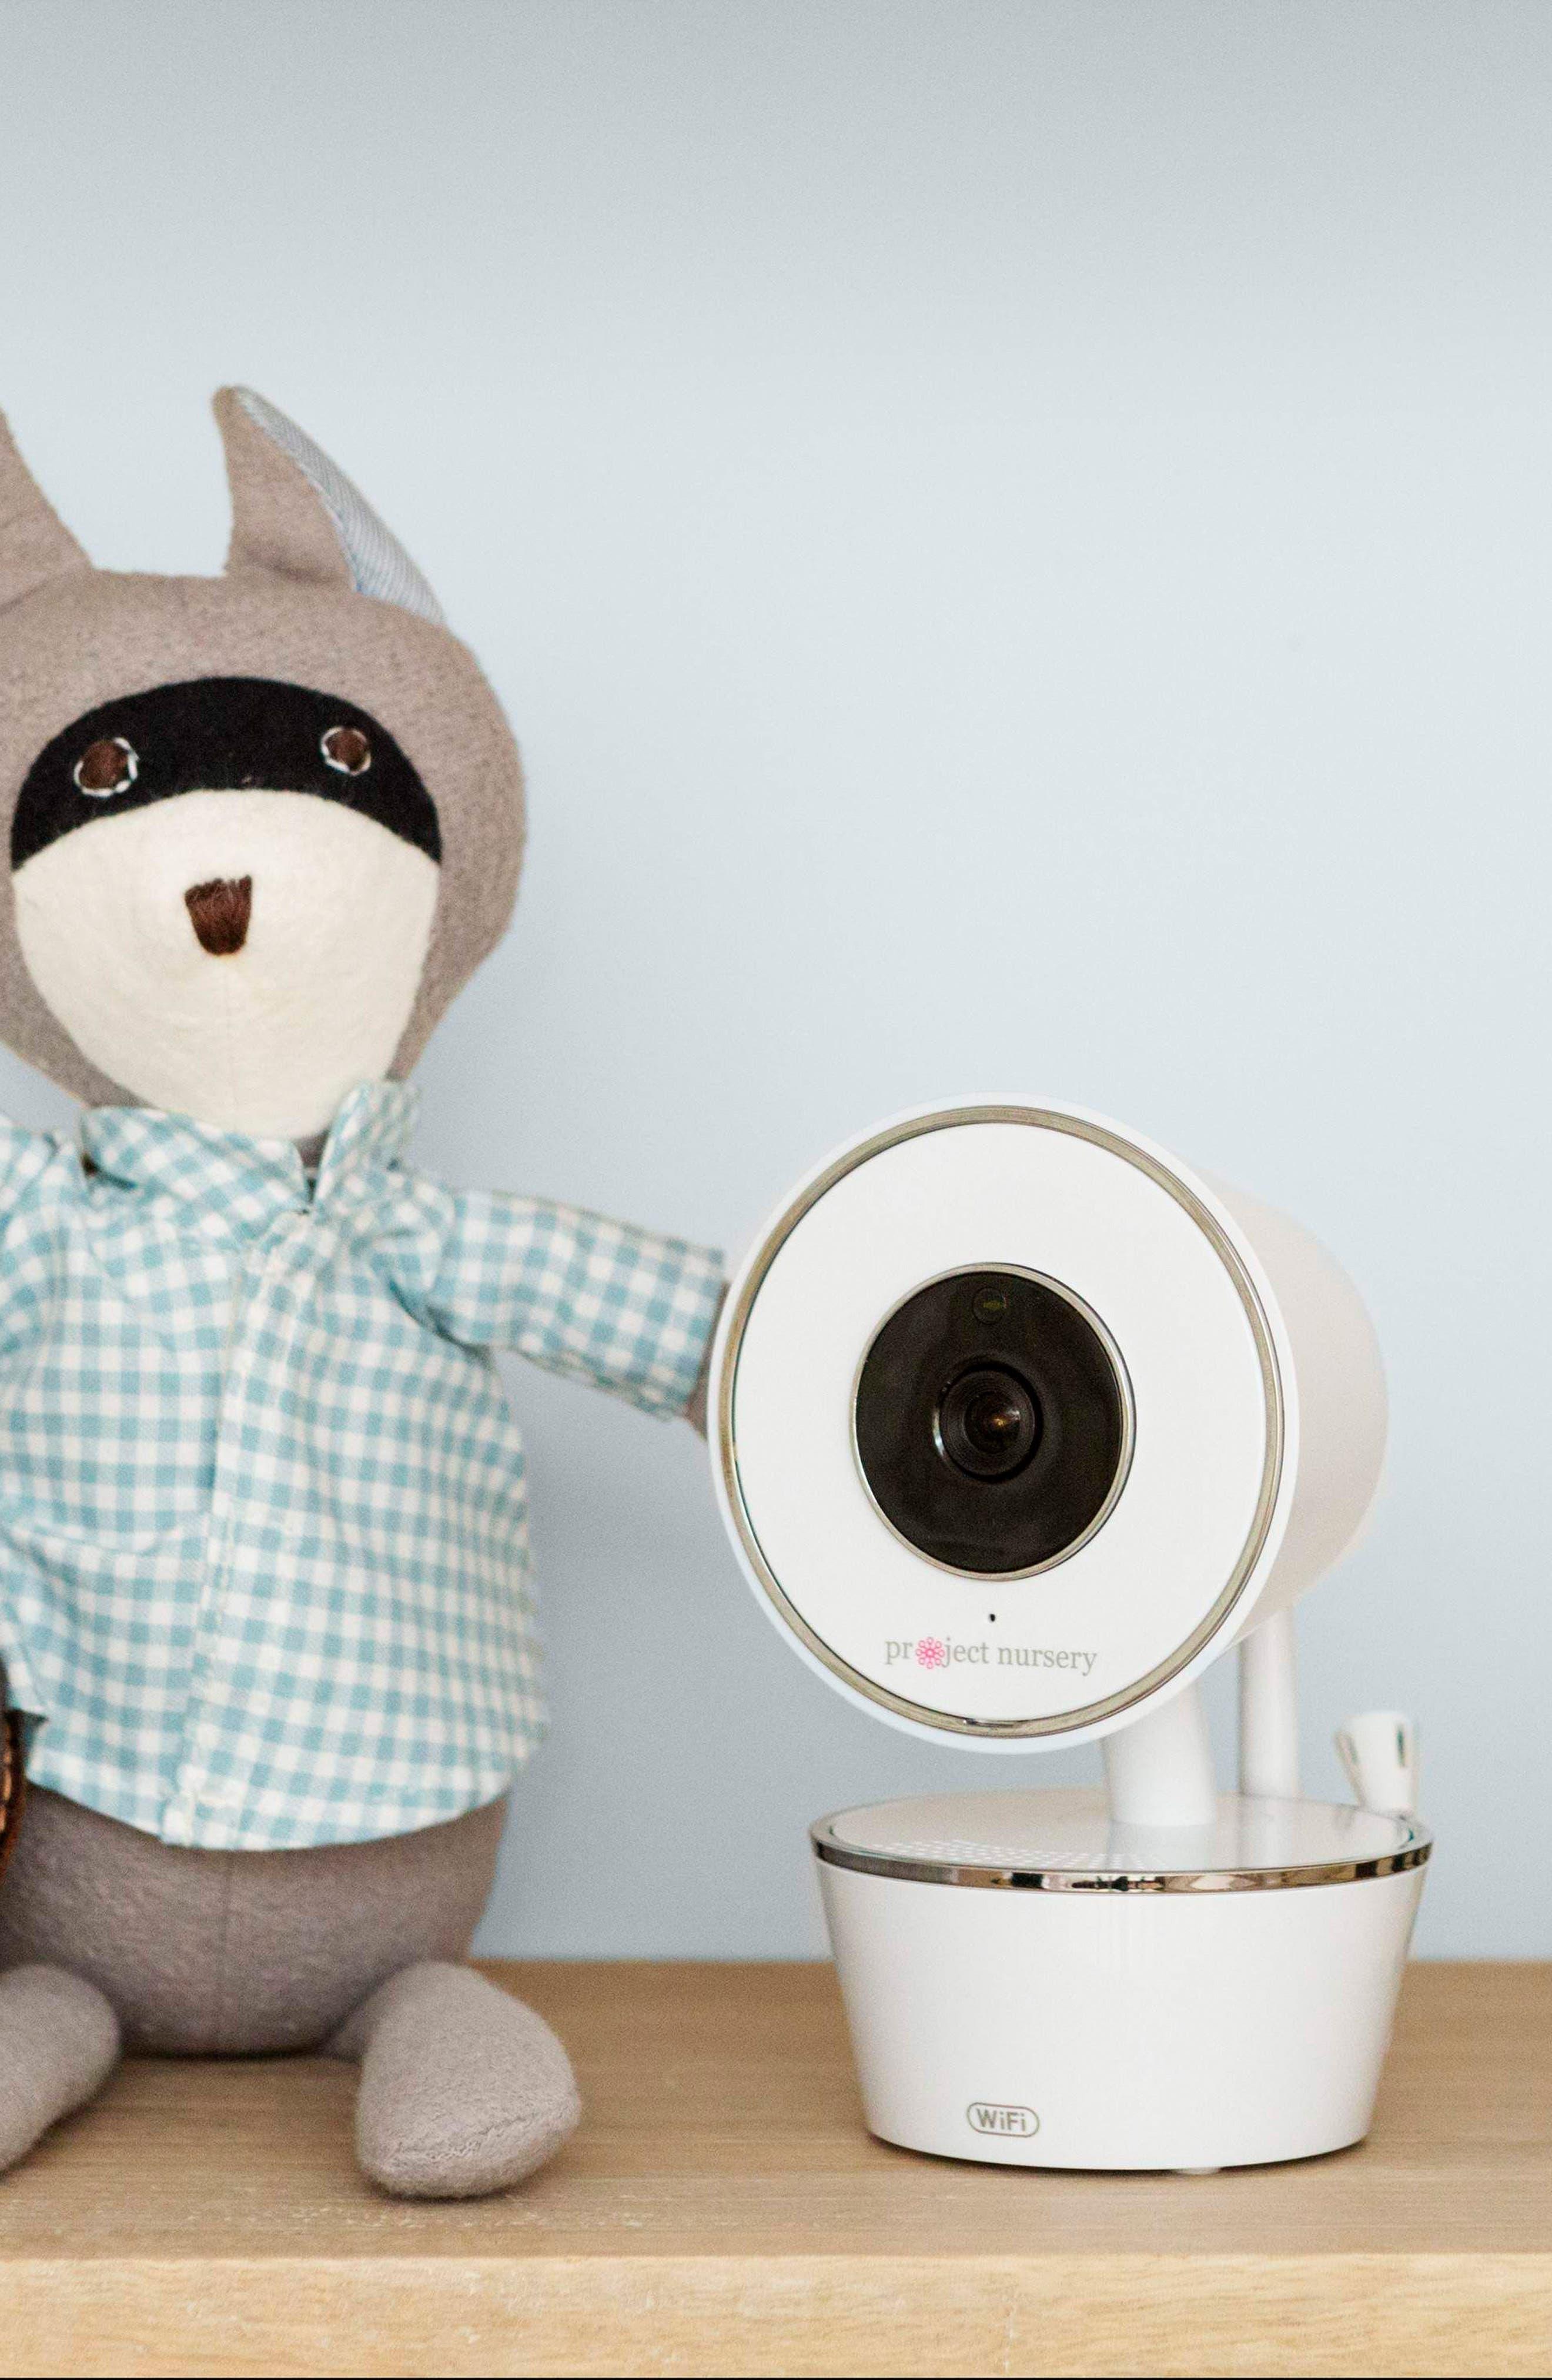 Smart Nursery Wi-Fi Baby Monitor,                             Alternate thumbnail 2, color,                             White